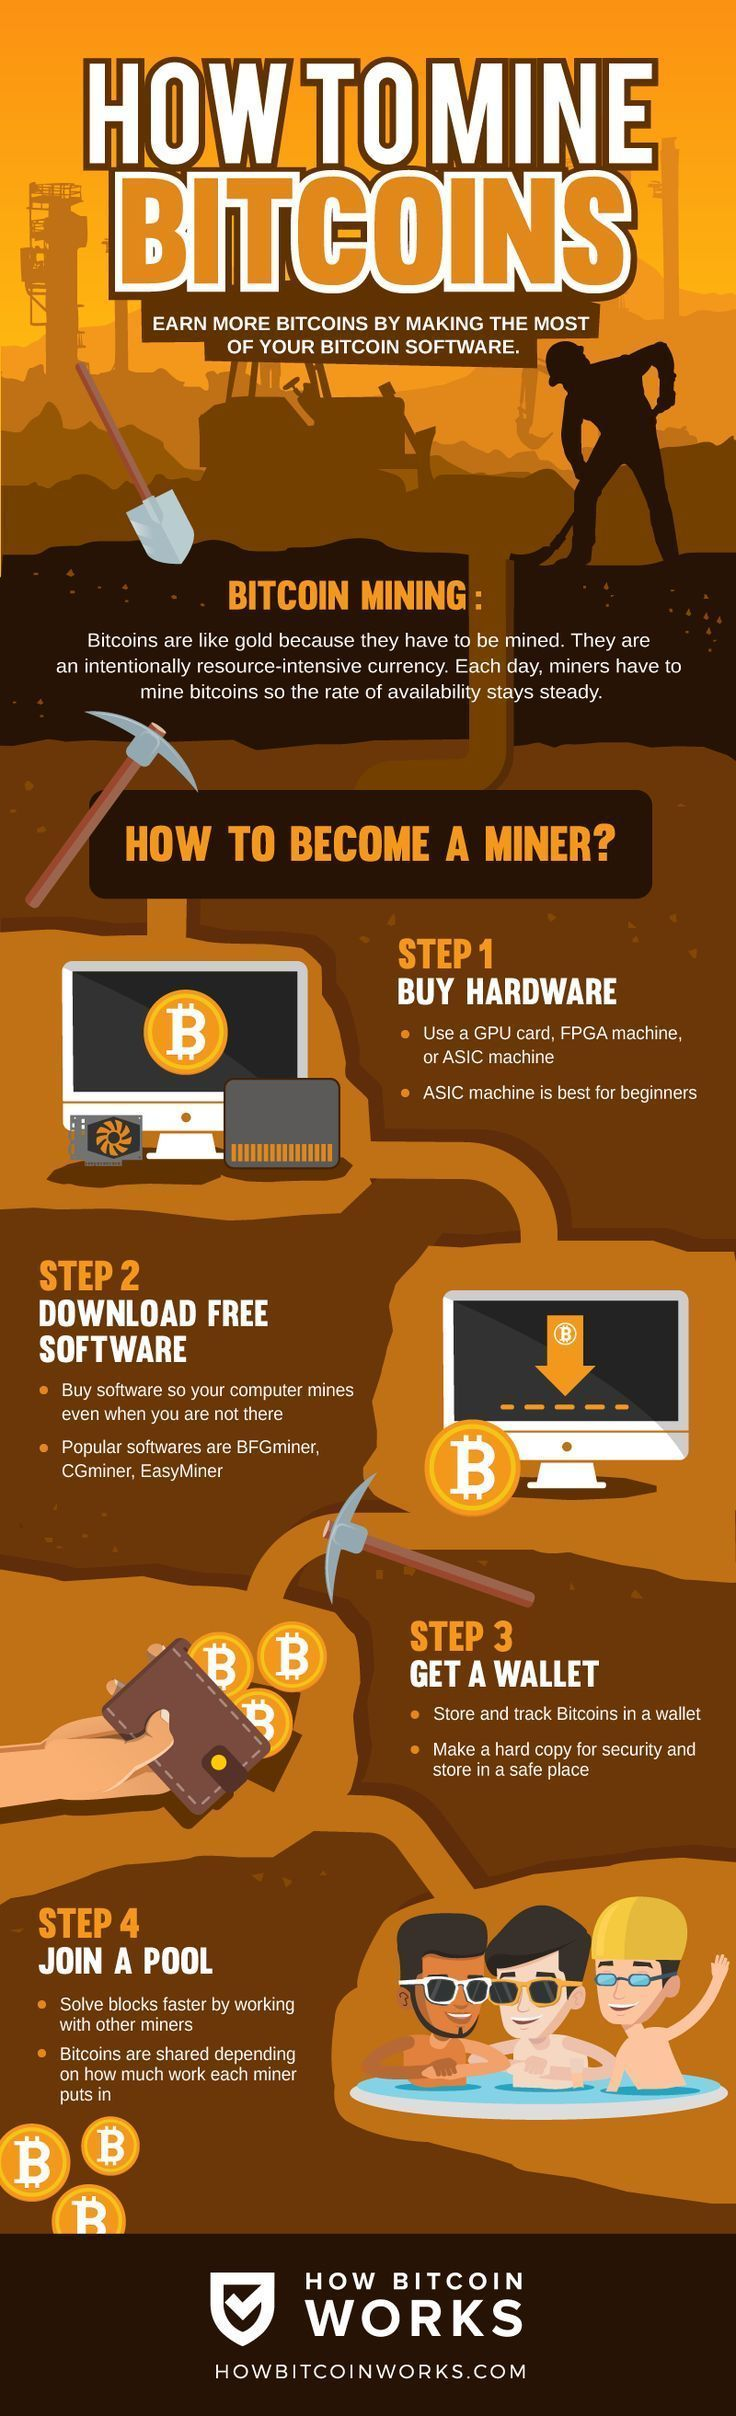 early bitcoin mining software